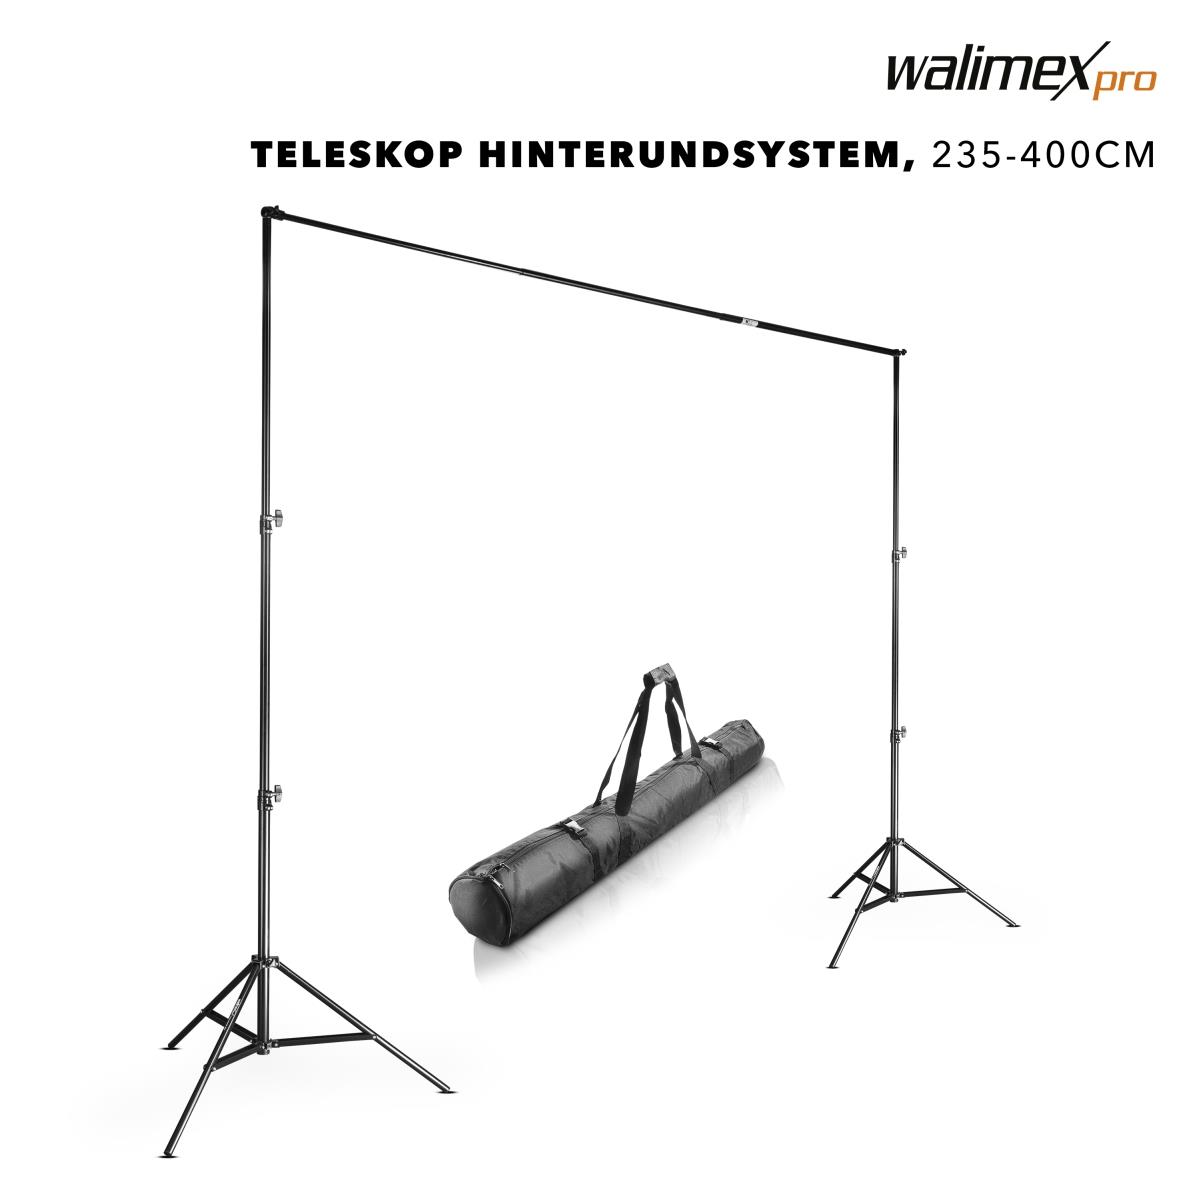 Walimex pro Teleskop Hintergrundsystem XL 225-400 cm